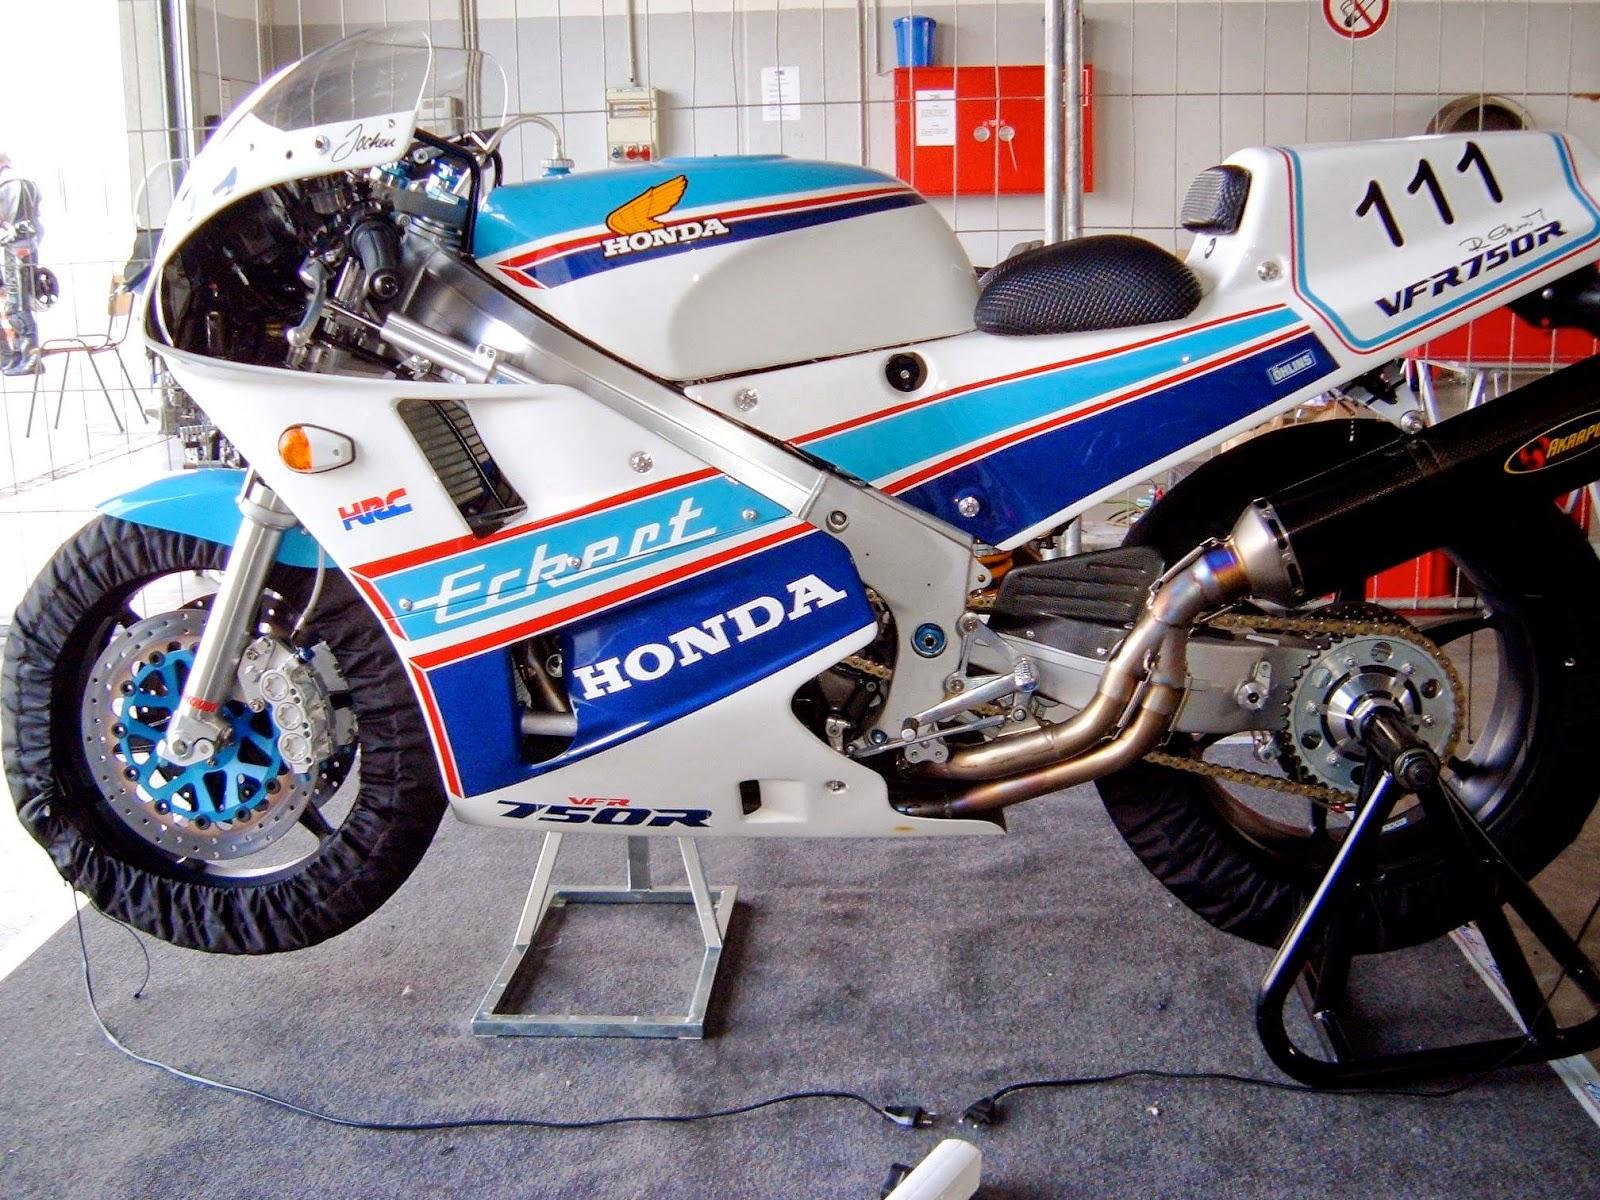 Honda RC 30 - Page 5 10842122_10202418166010564_976405127127414635_o